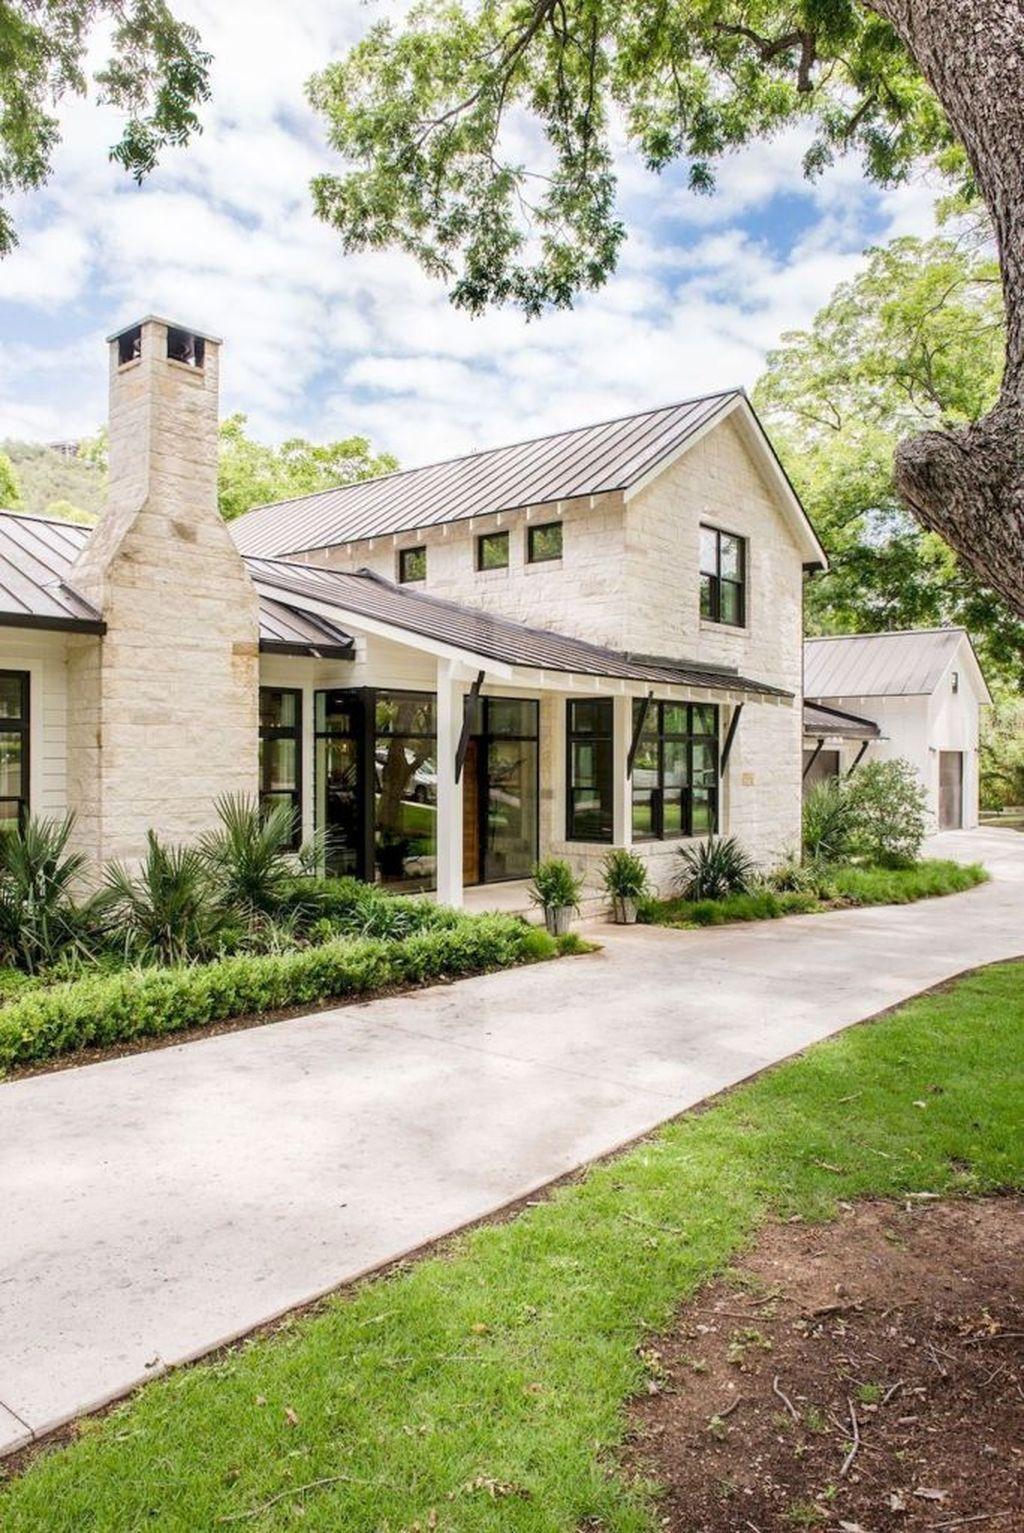 Captivating Farmhouse Exterior House Design Ideas To Copy Right Now 08